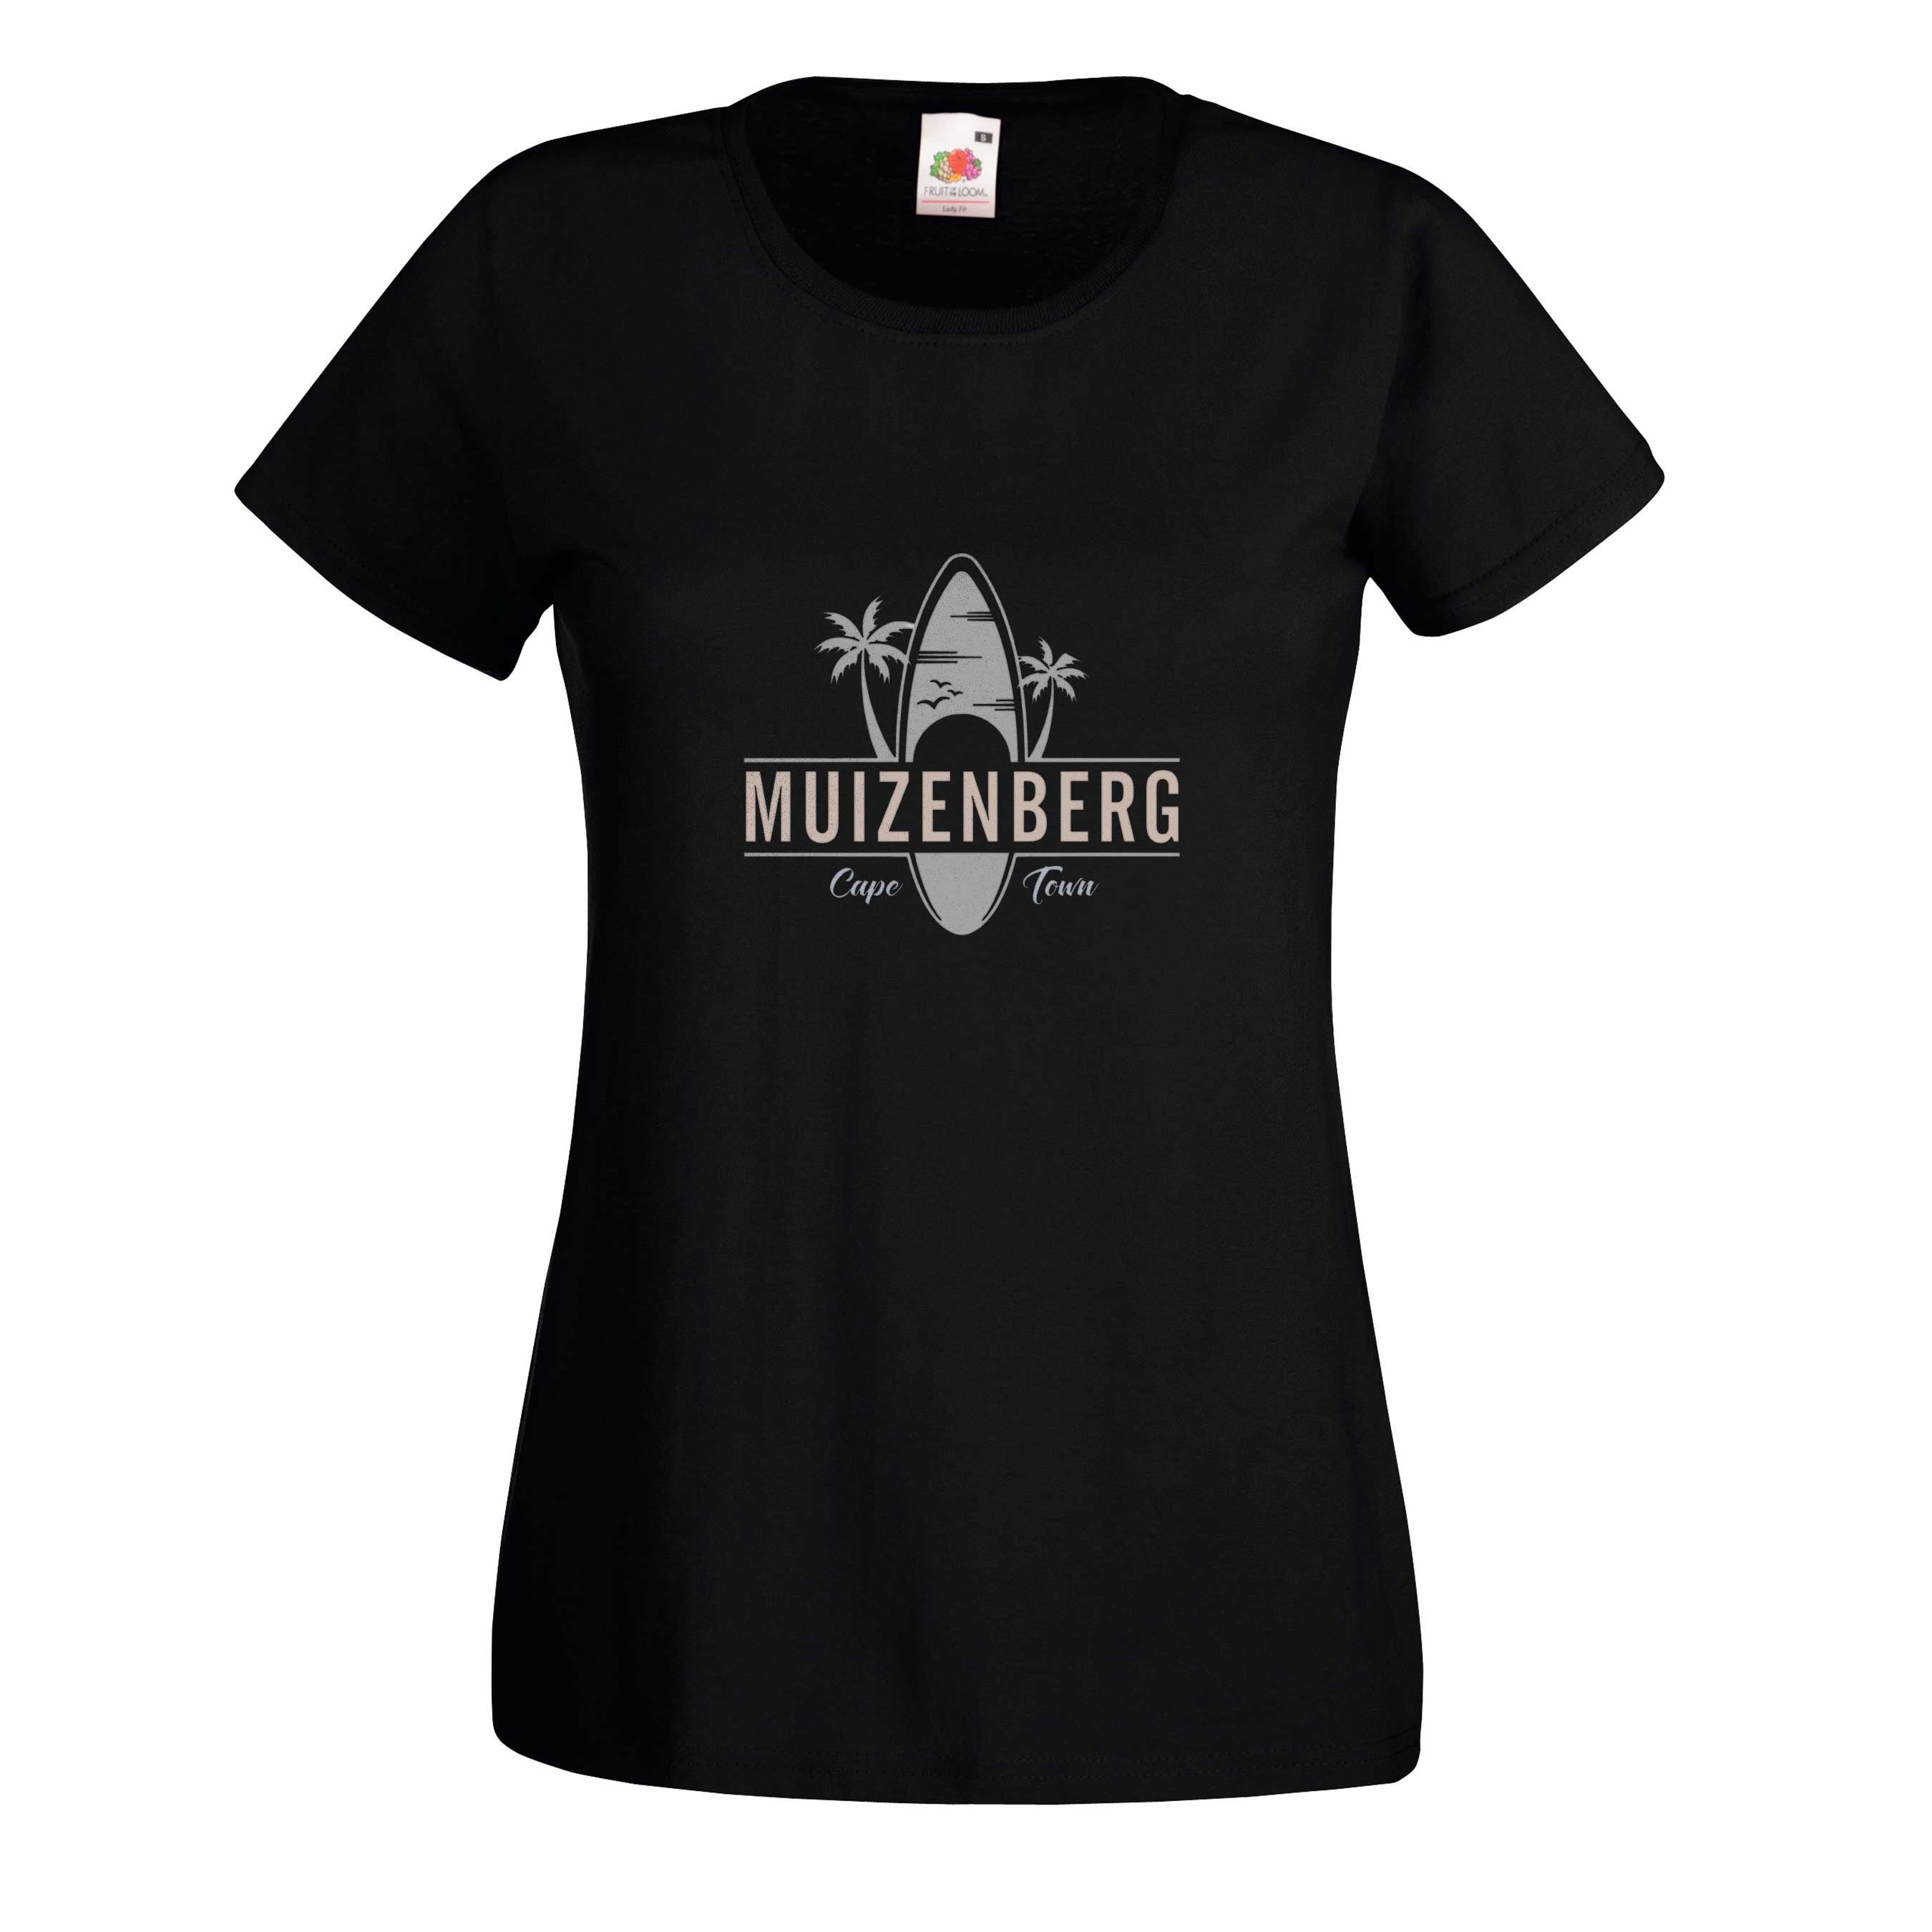 Muizenburg Surf design for t-shirt, hoodie & sweatshirt